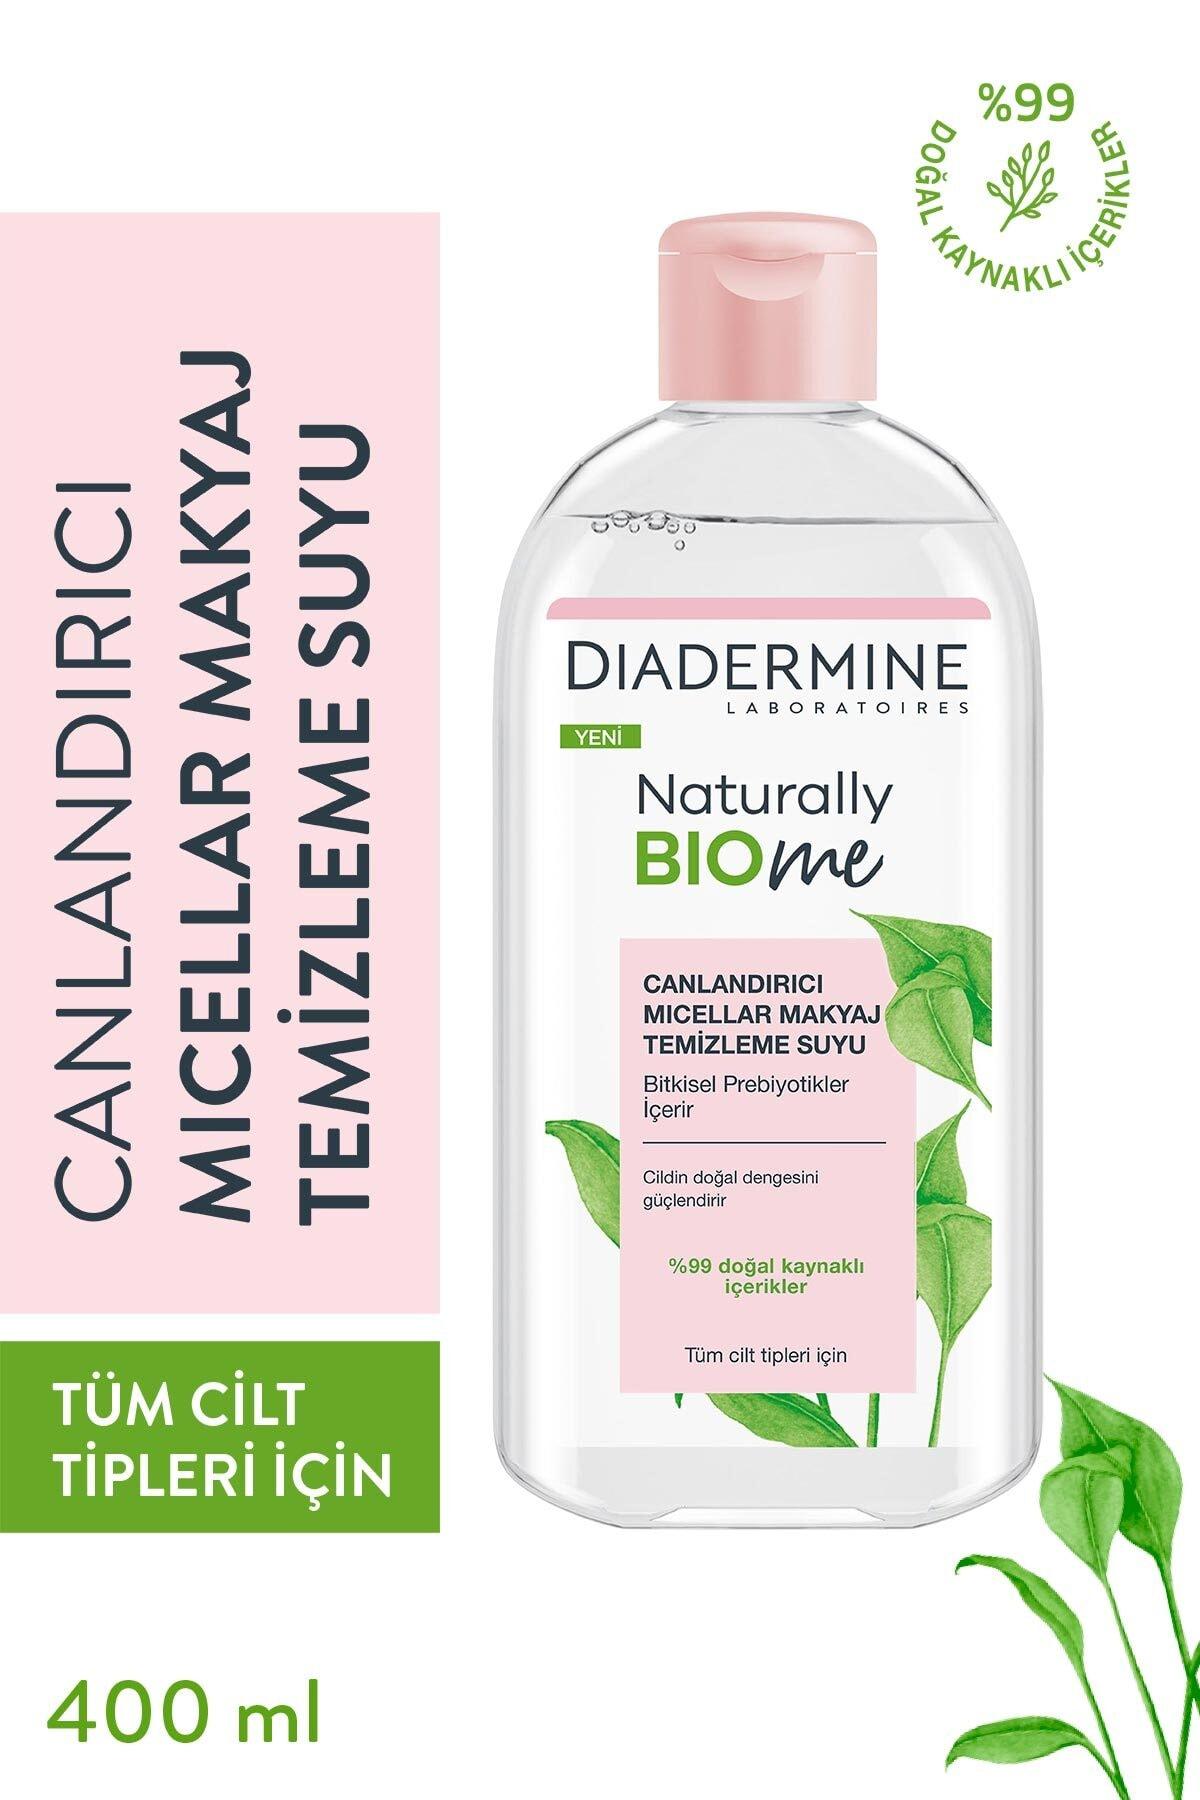 Diadermine Naturally Bio Me Canlandırıcı Micellar Makyaj Temizleme Suyu 1